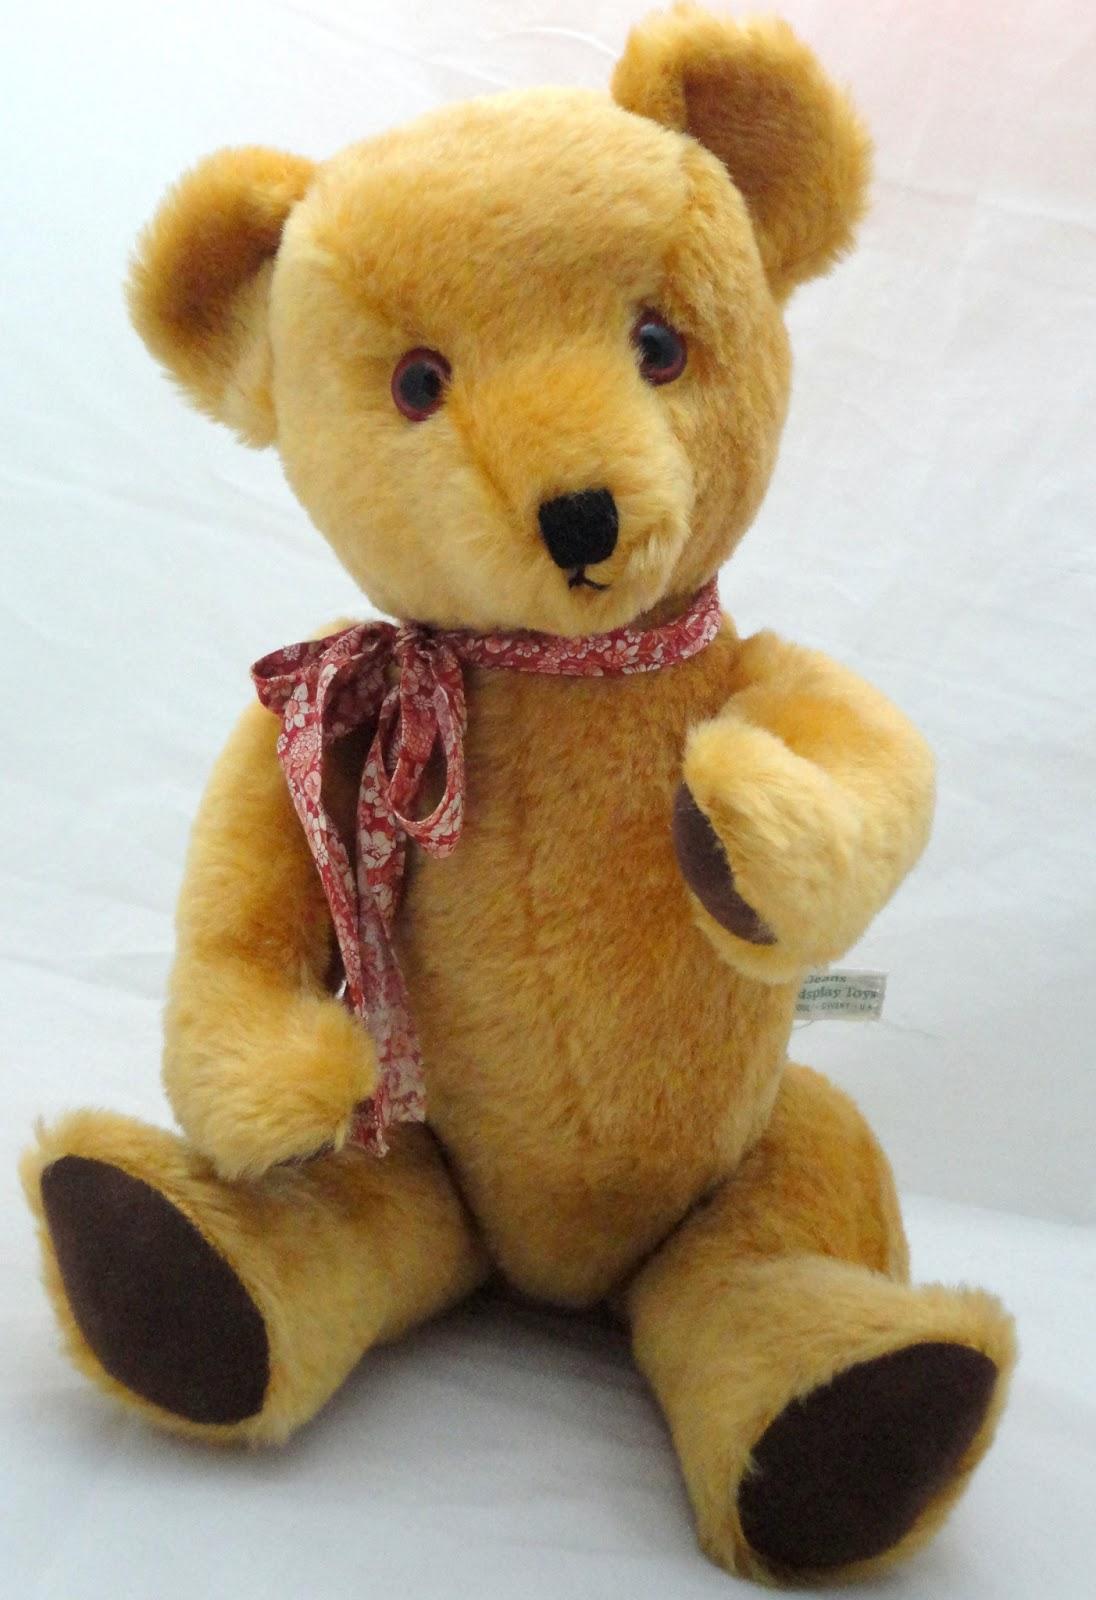 Dean's Rag Book/Childsplay & Gwentoys Ltd UK Collectible